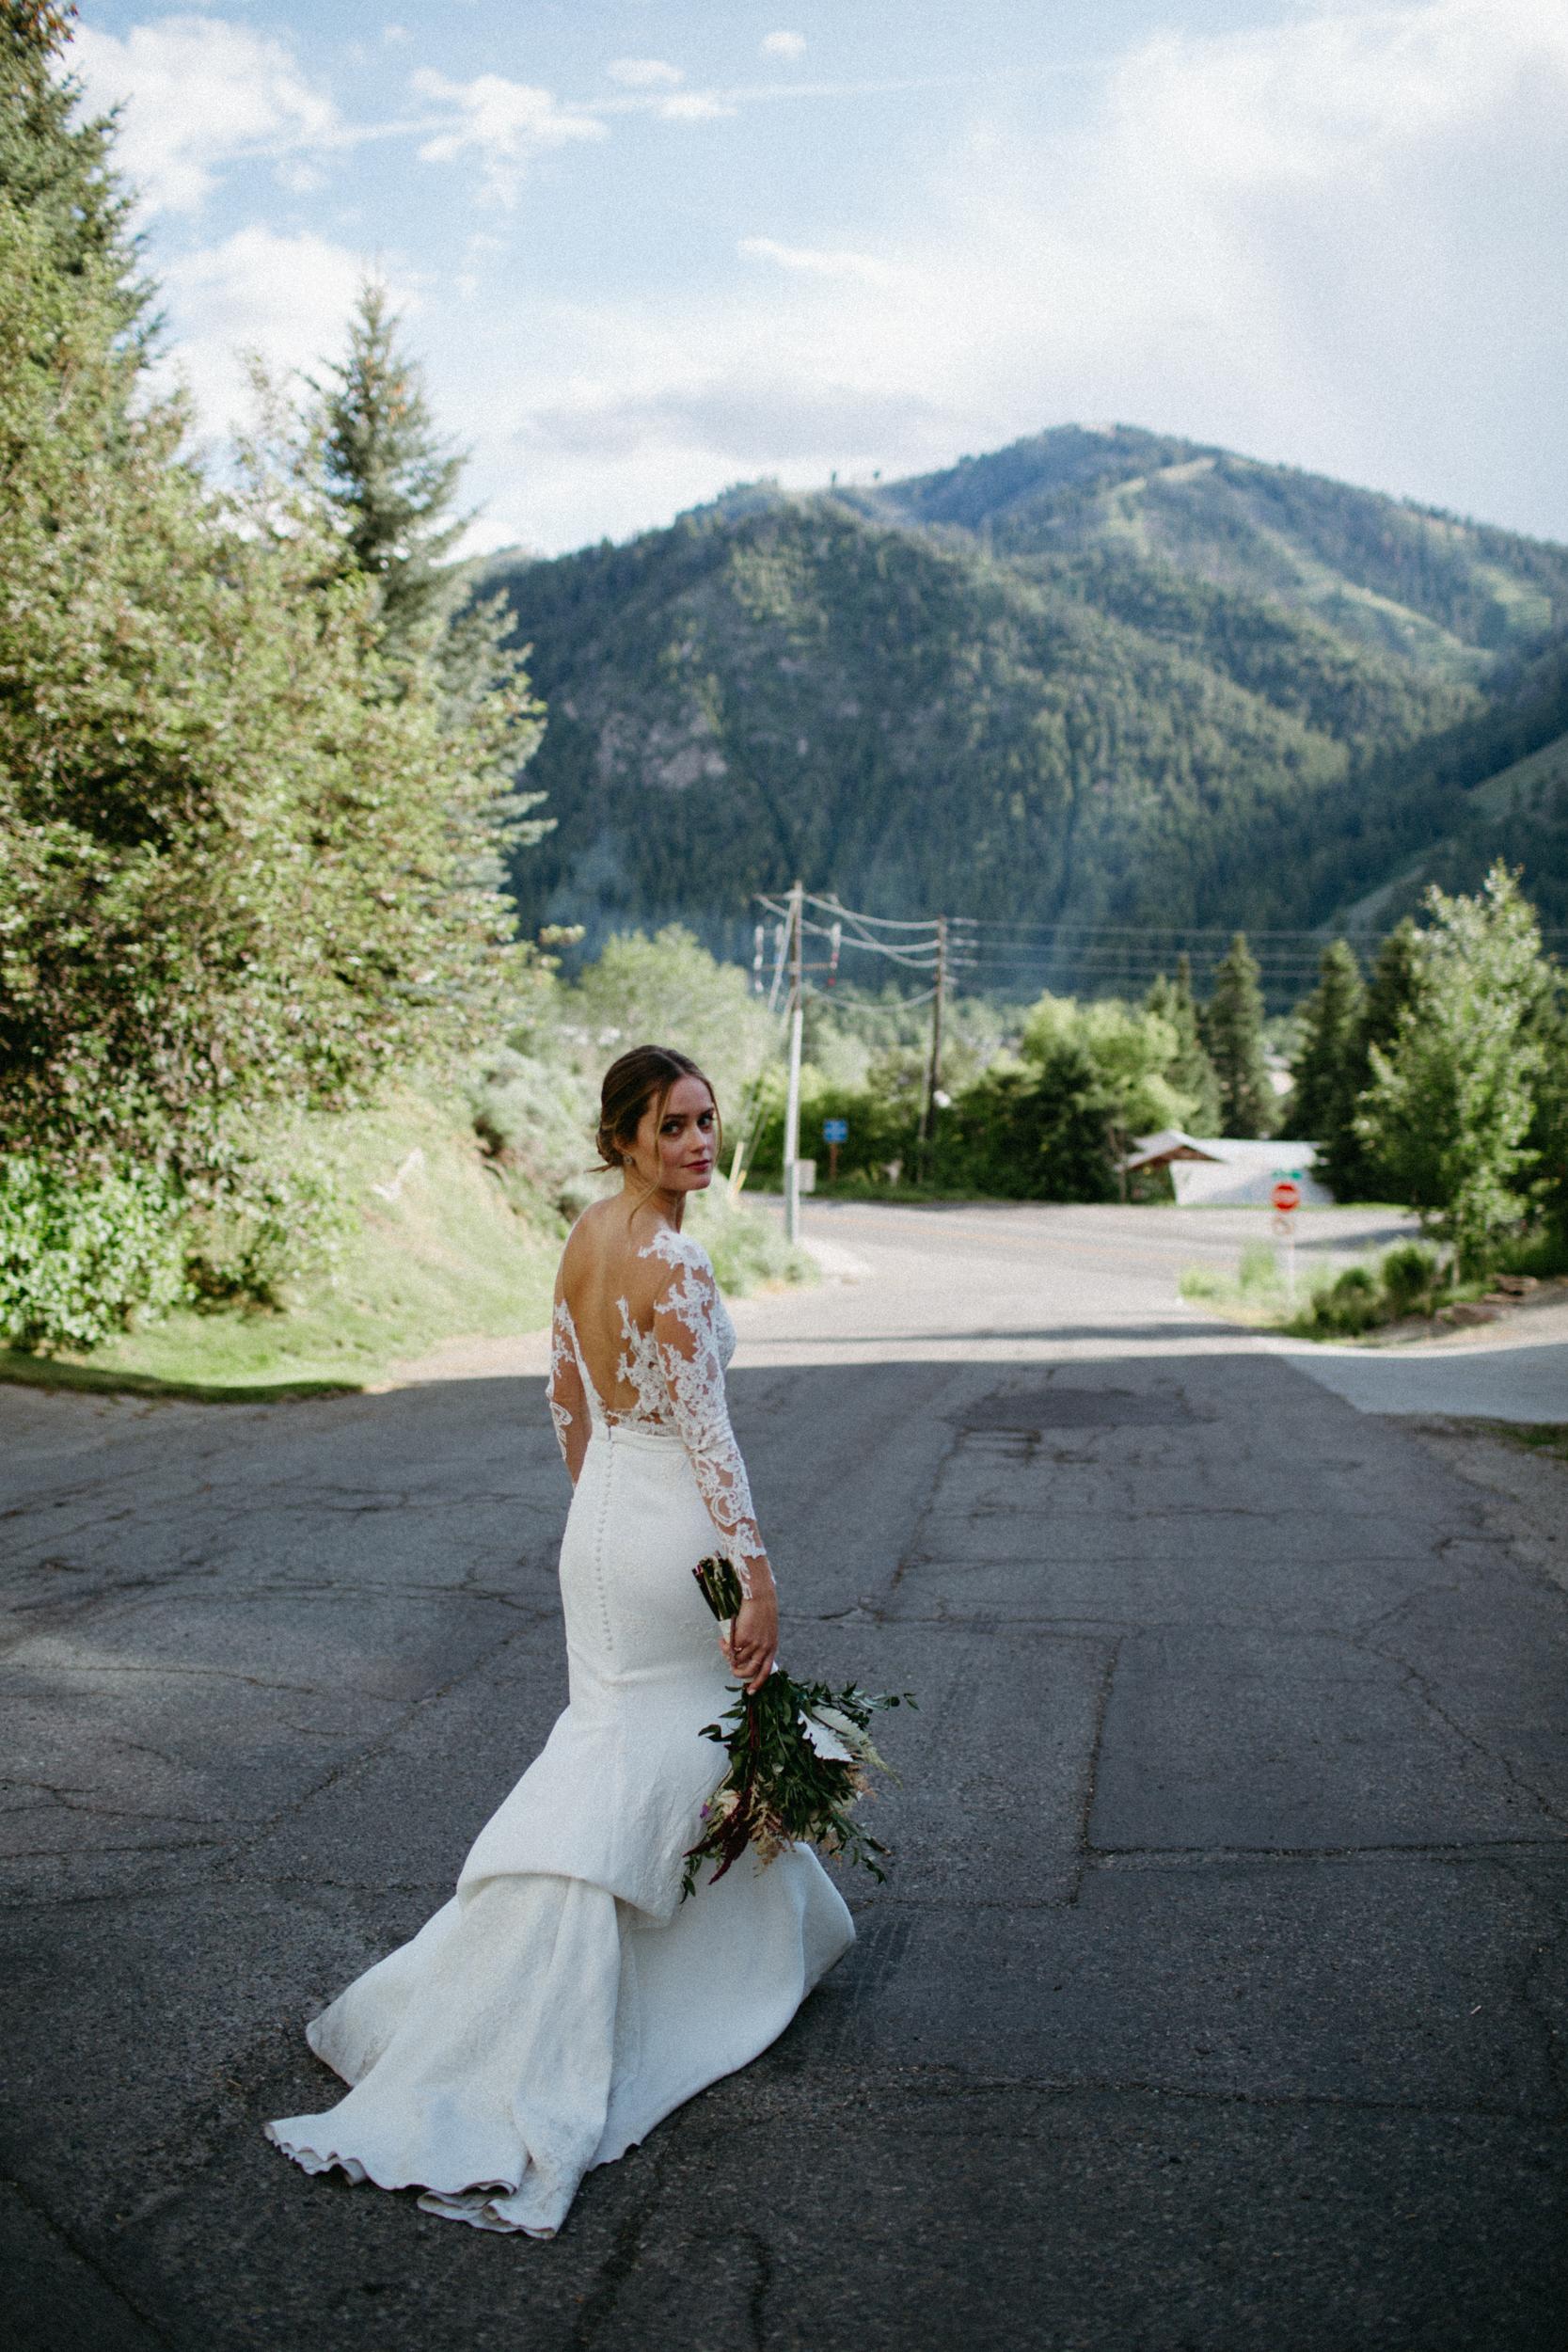 knob-hill-wedding-christinemarie-sun-valley-106.jpg